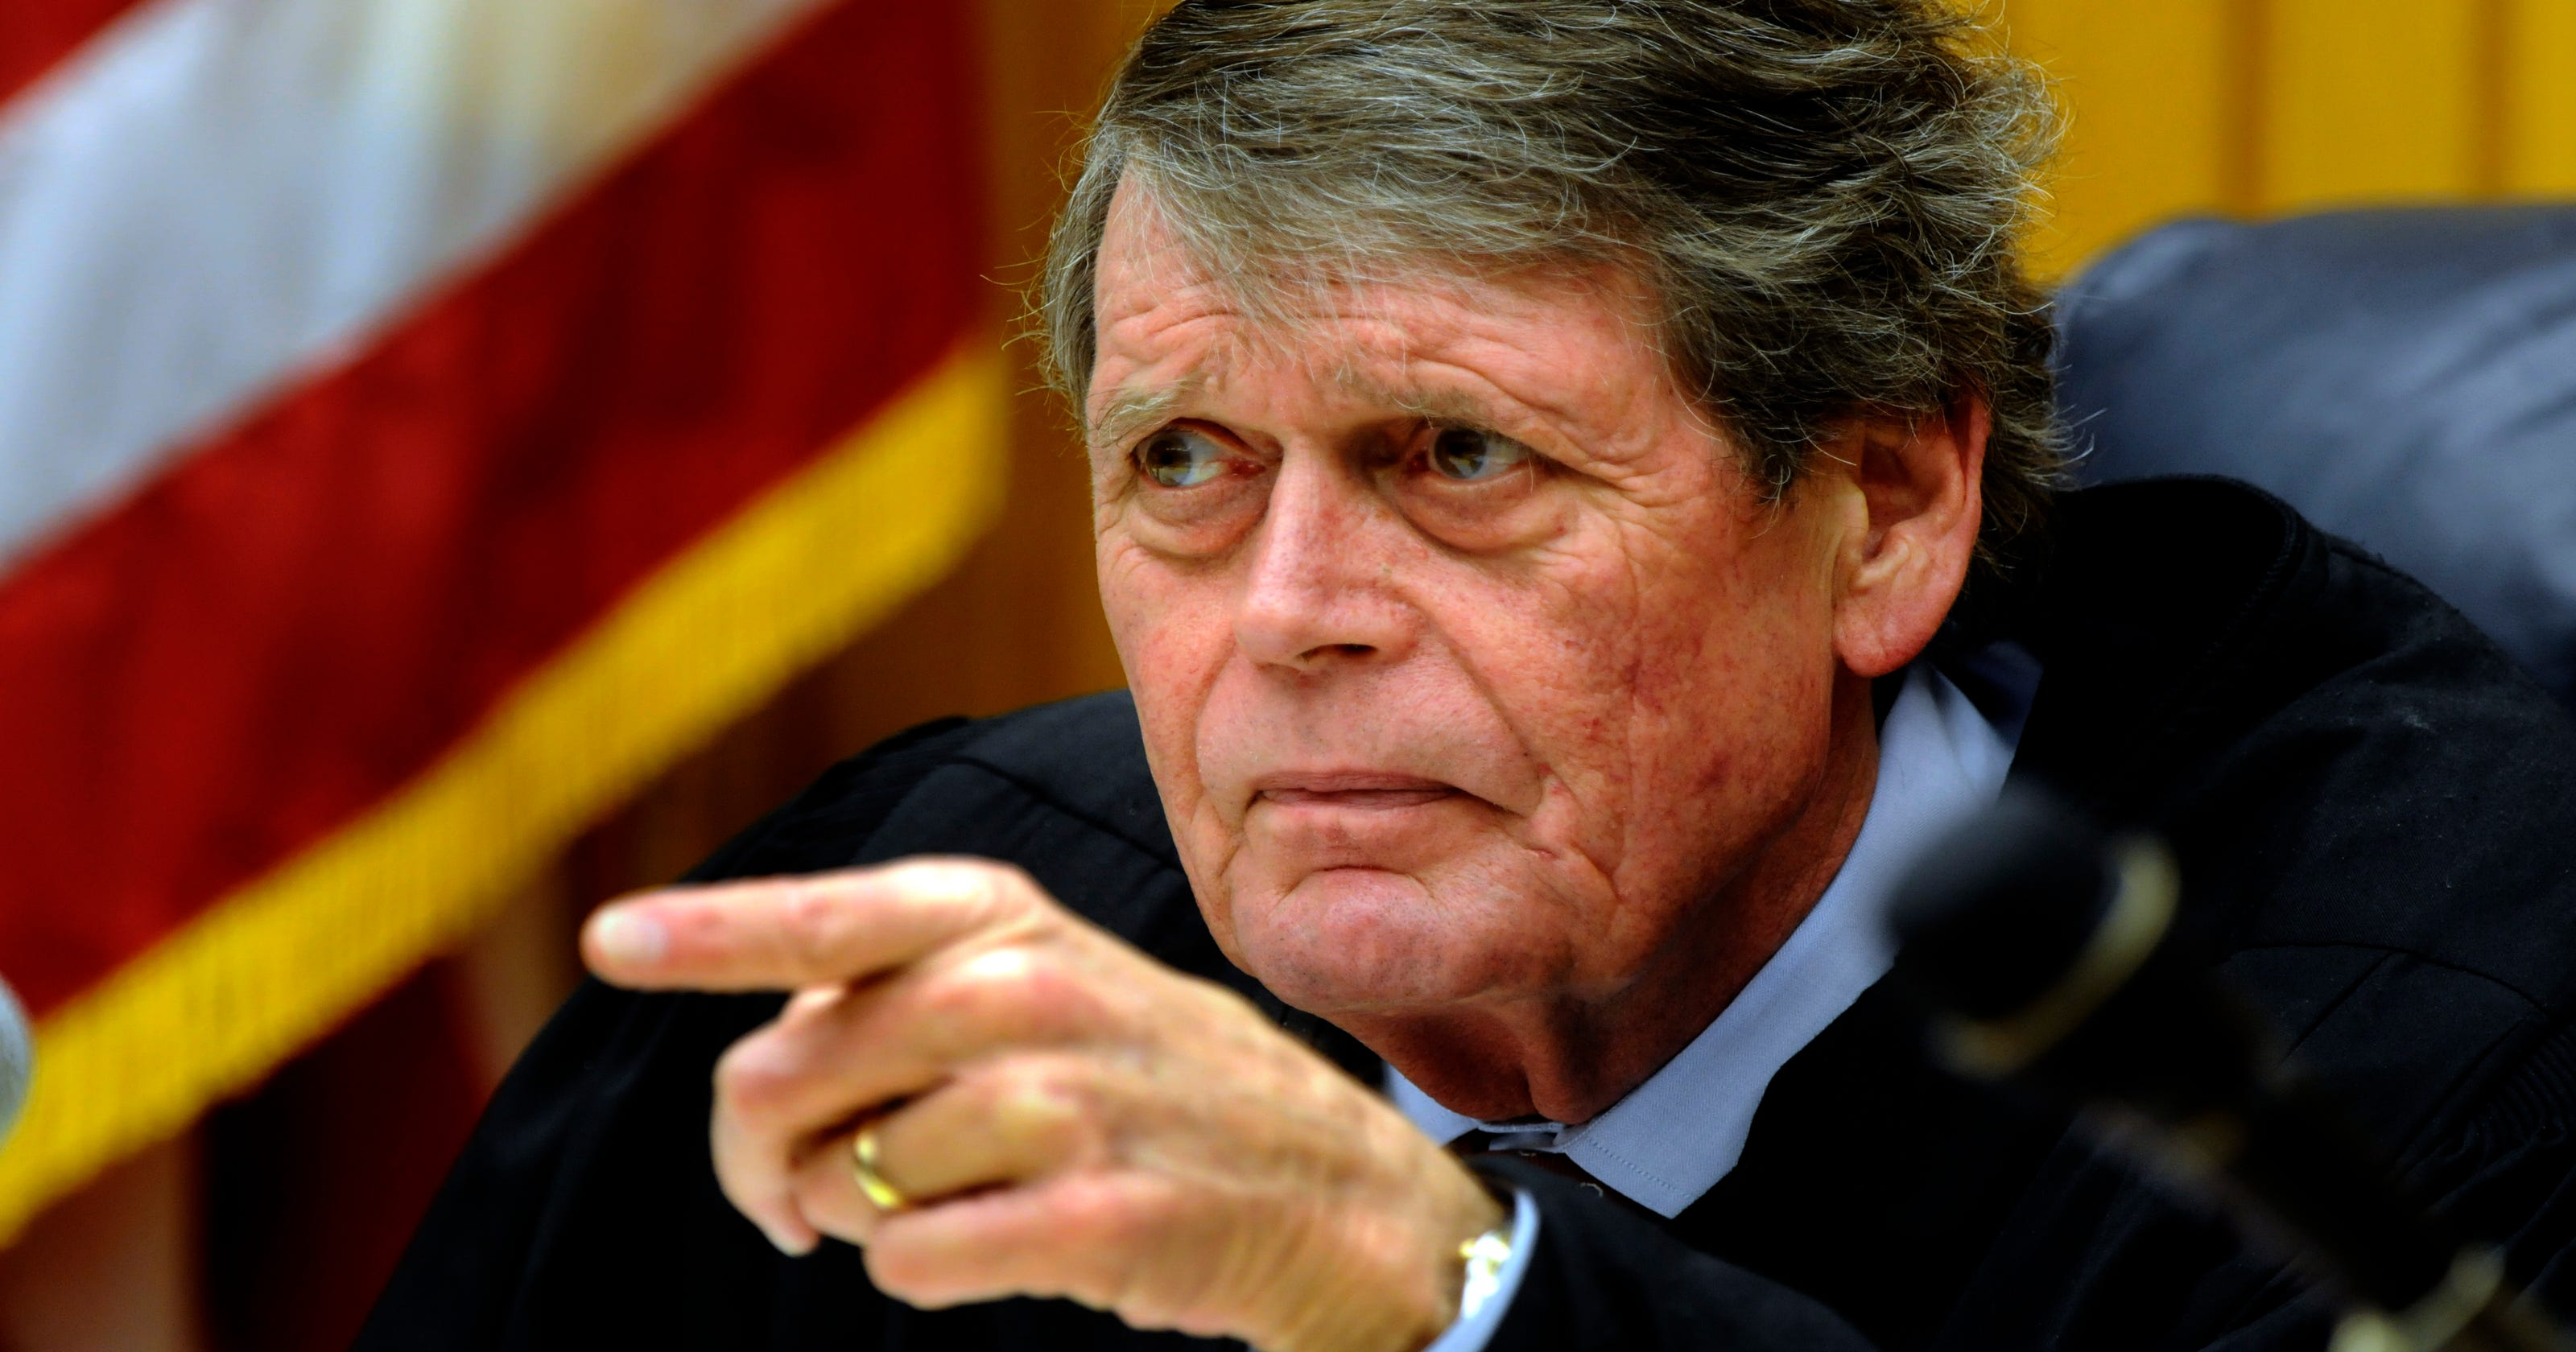 Ex-Knox County judge Richard Baumgartner dies at age 70